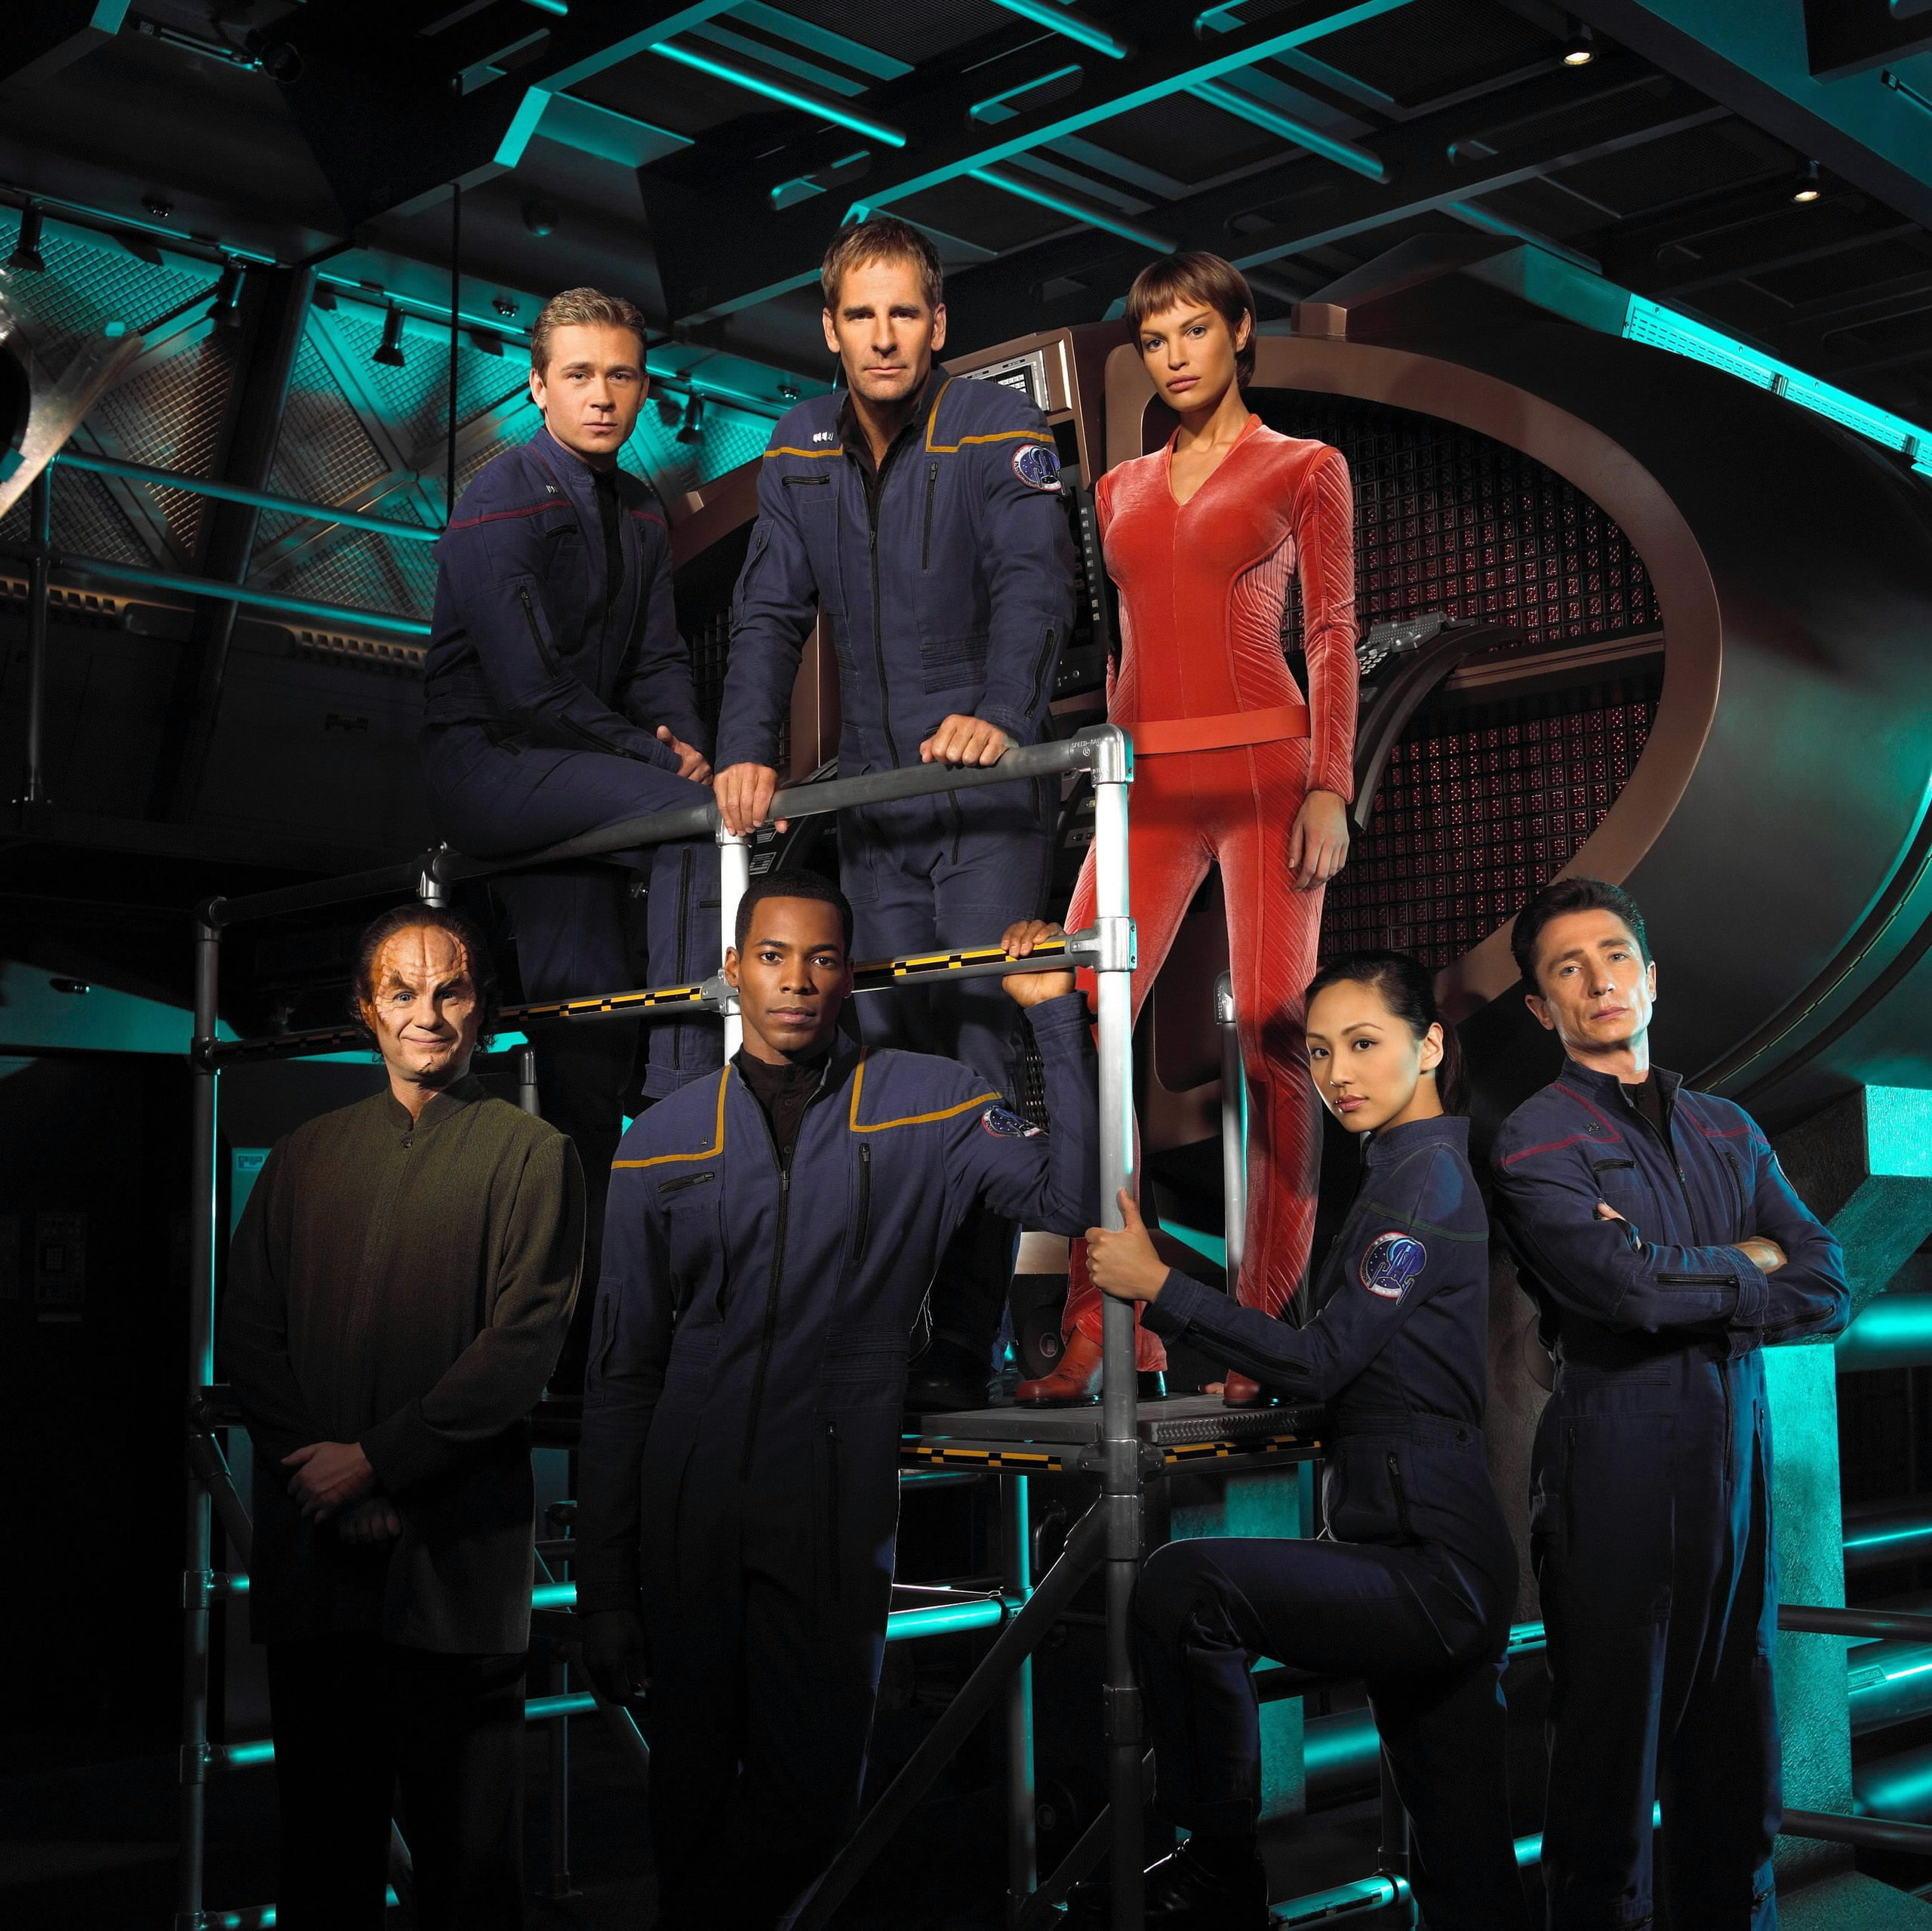 star-trek-enterprise-cast-star-trek-enterprise-7651373-2560-2559.jpg